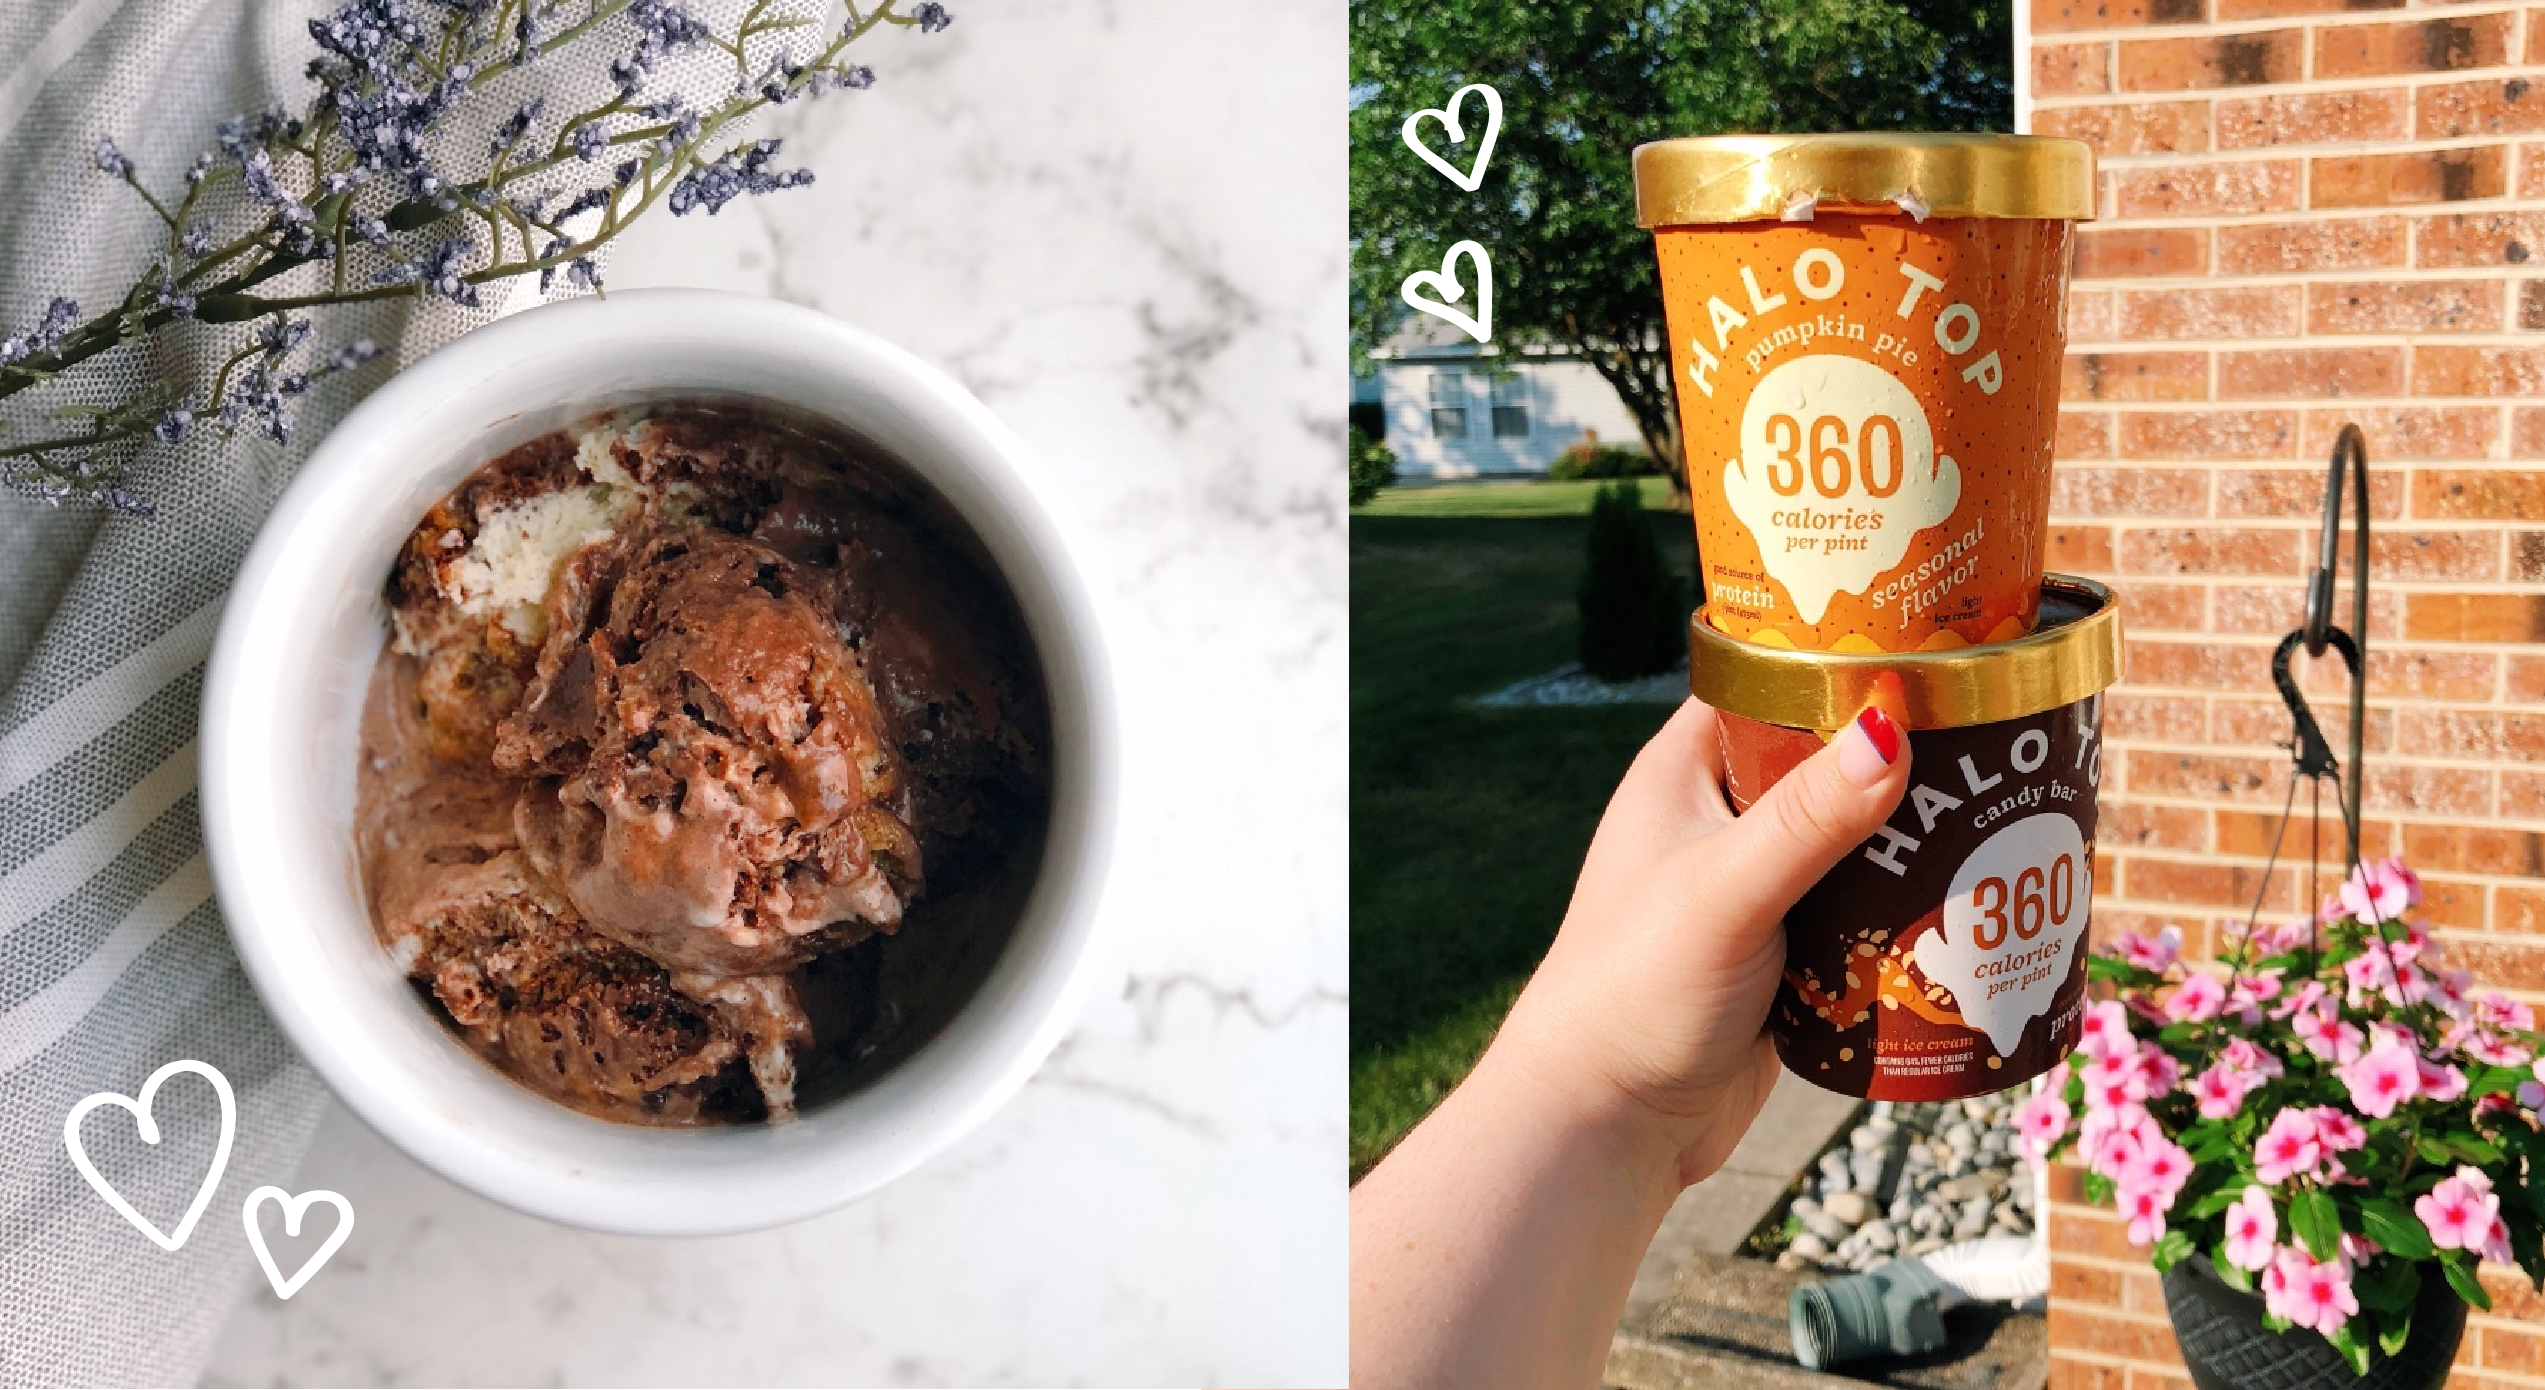 The Top 5 Low-Calorie Ice Cream Pints